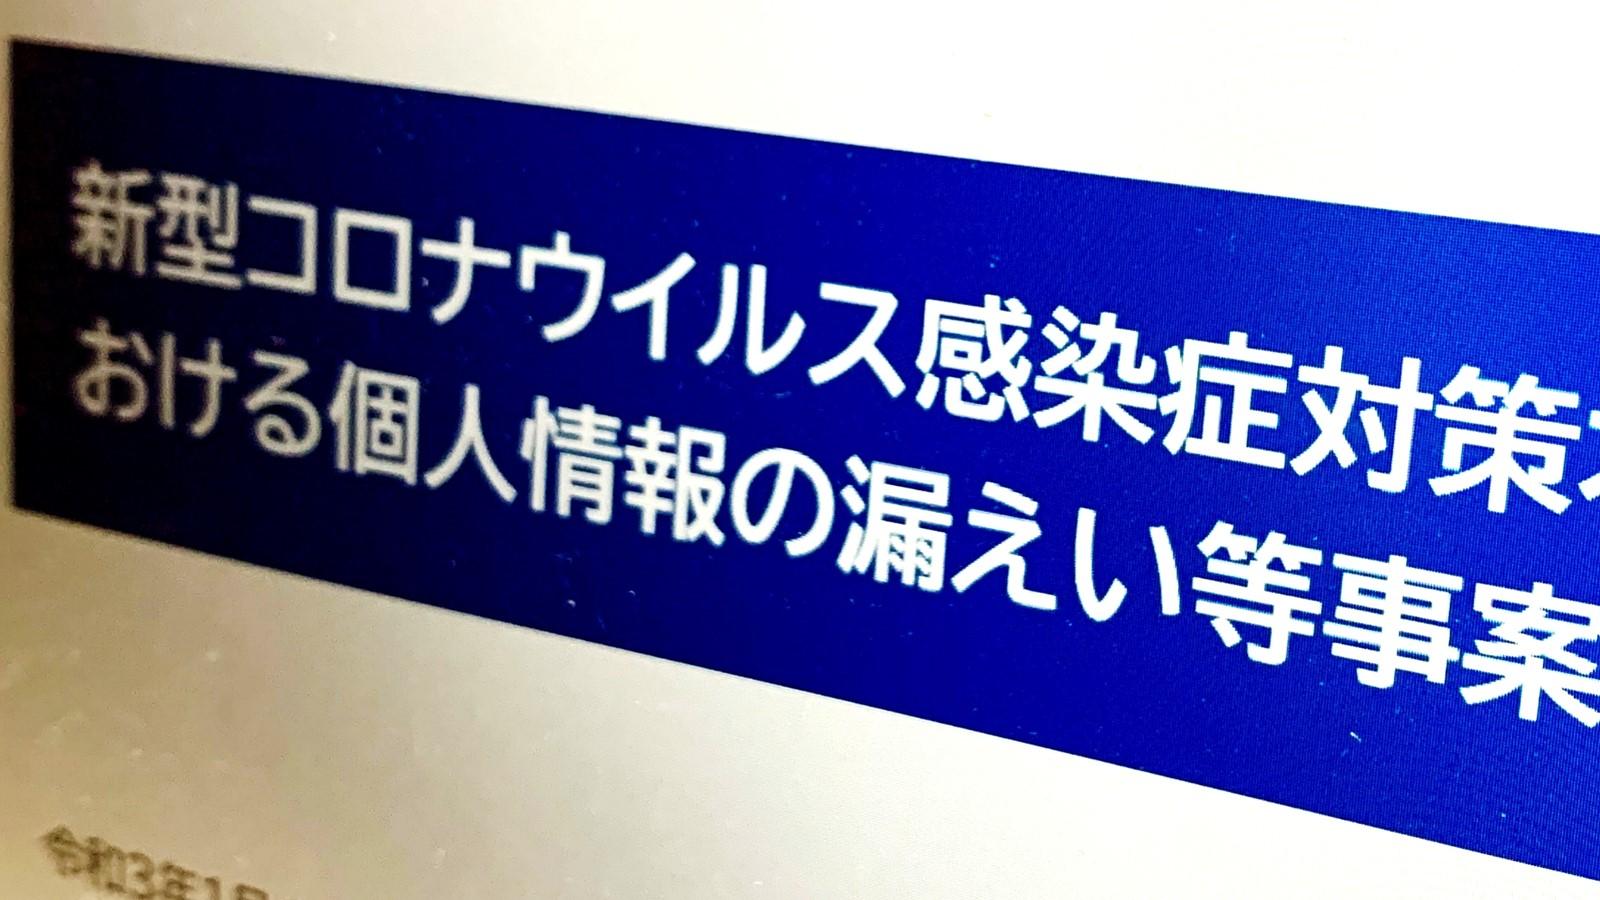 福岡 県内 コロナ 感染 情報